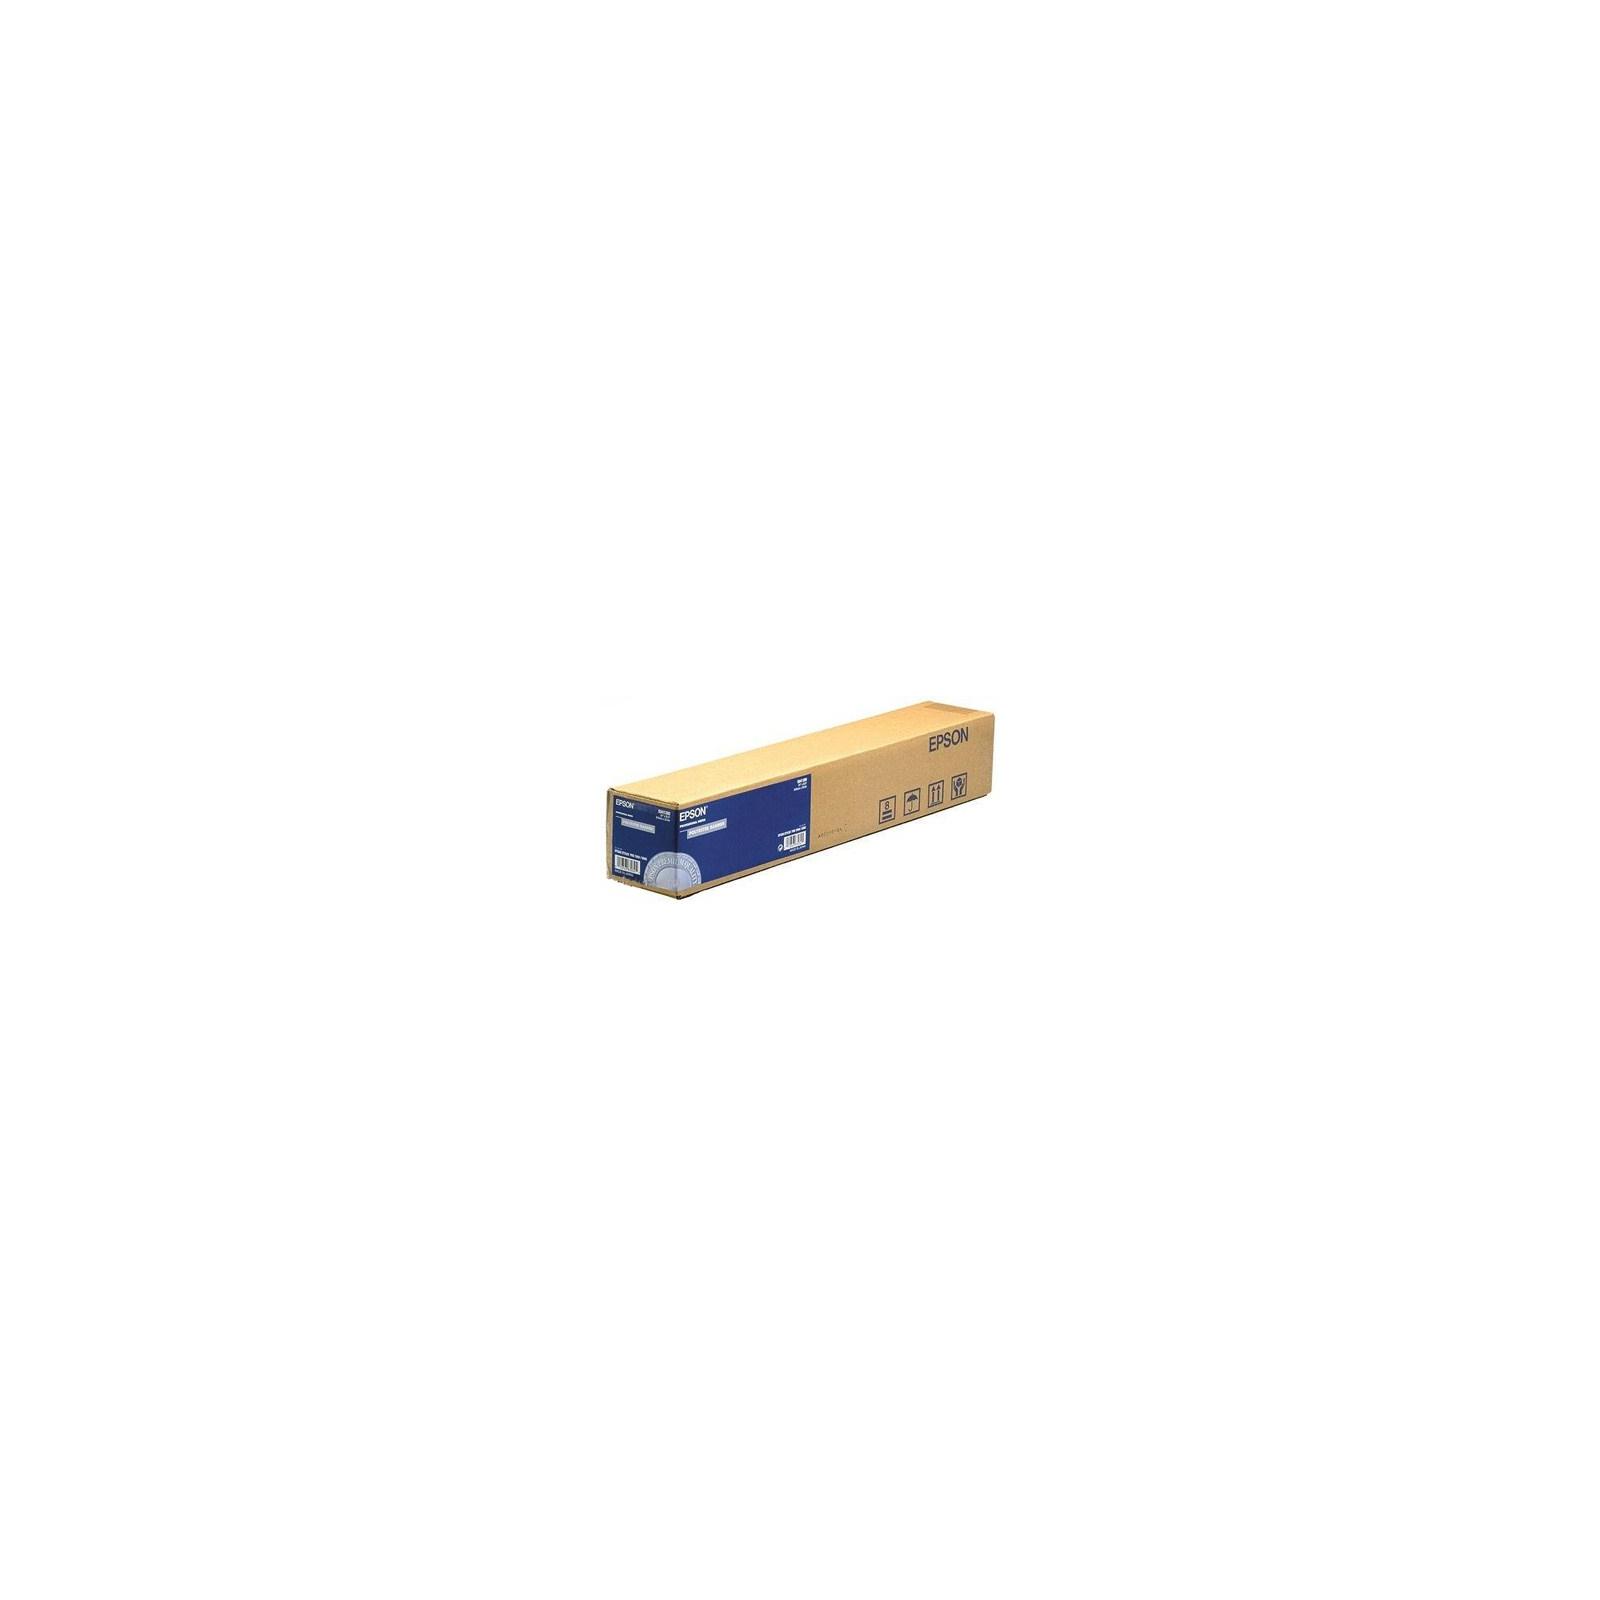 "Пленка для печати EPSON 60"" Matte Backlit Film (C13S045085)"